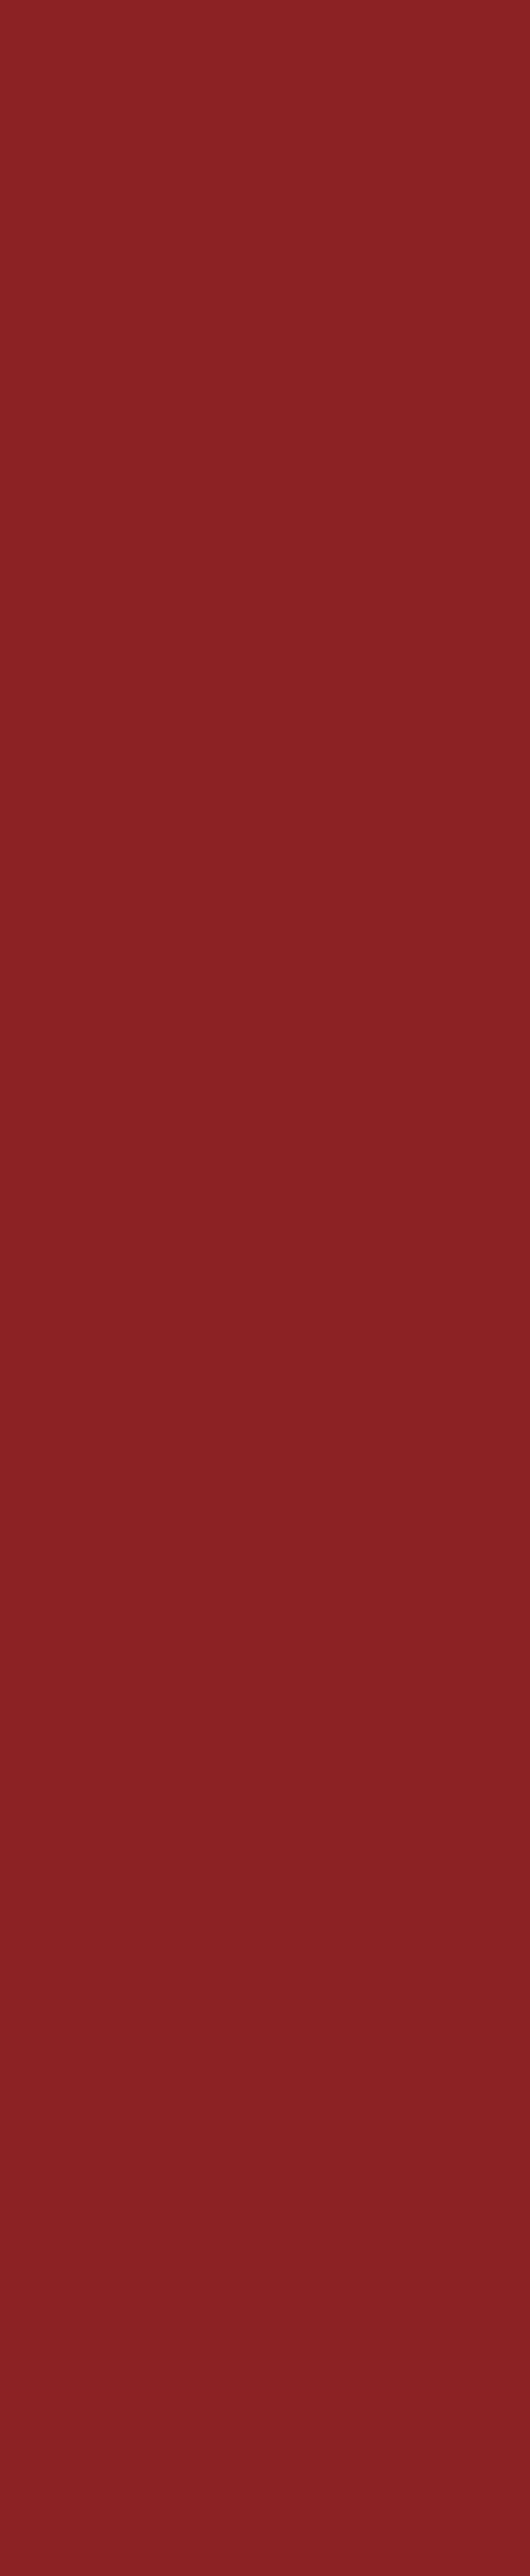 ColorBlockRed.jpg